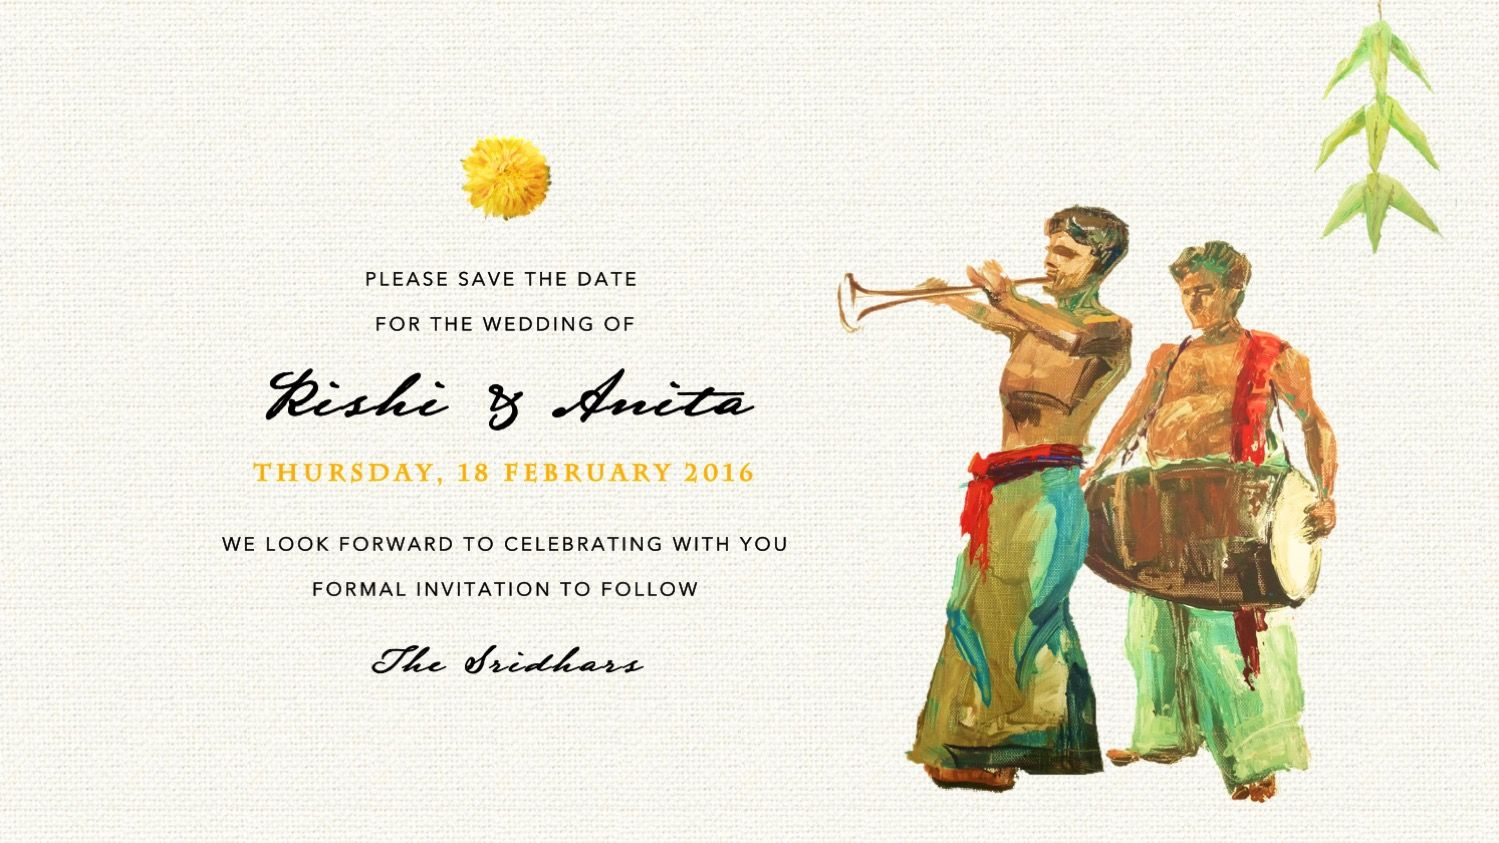 Weddings Wedding saving, Indian wedding invitation cards